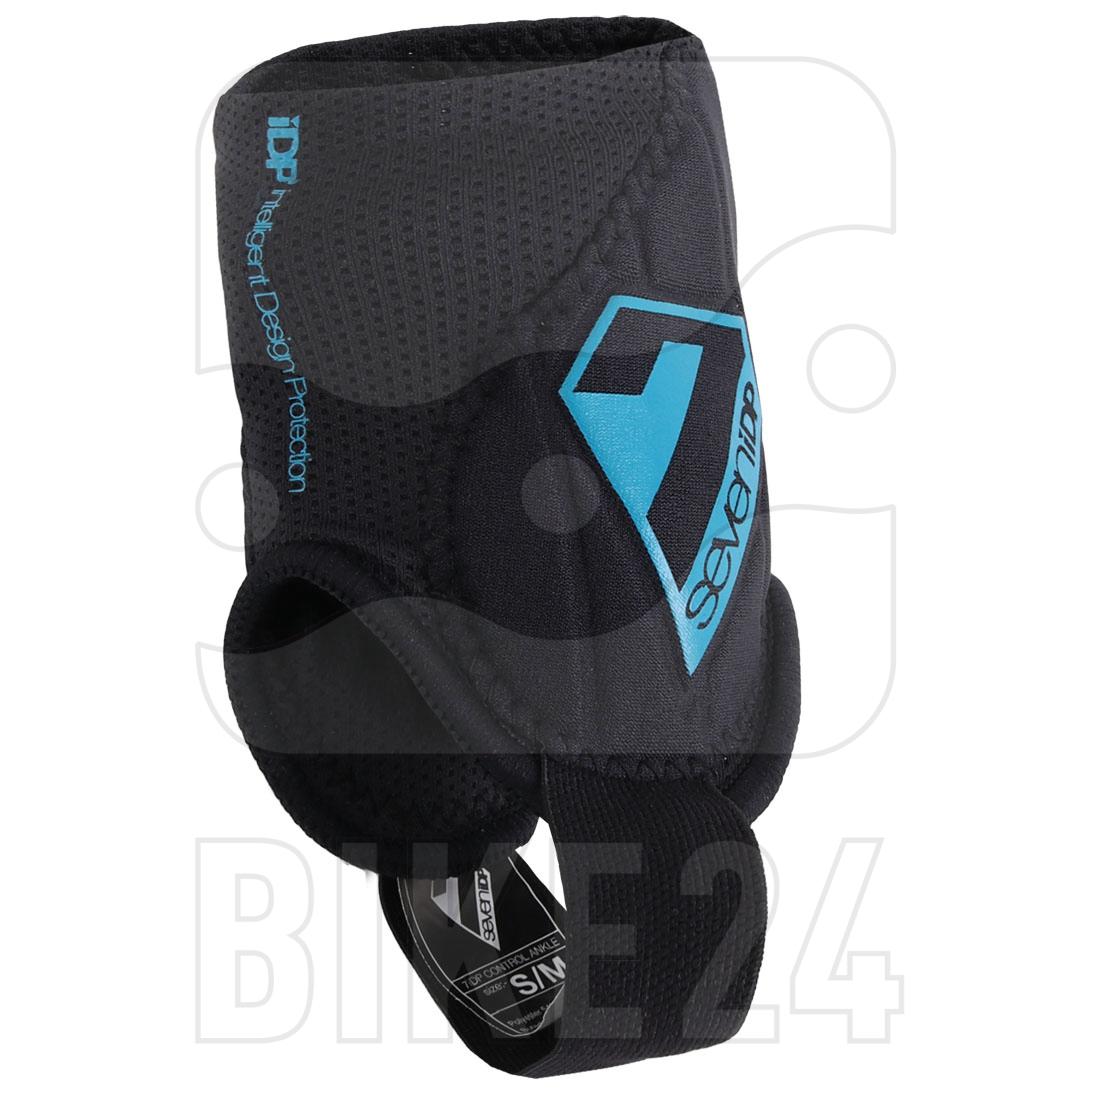 Imagen de 7 Protection 7iDP Control Ankle Protector Pads - black-blue